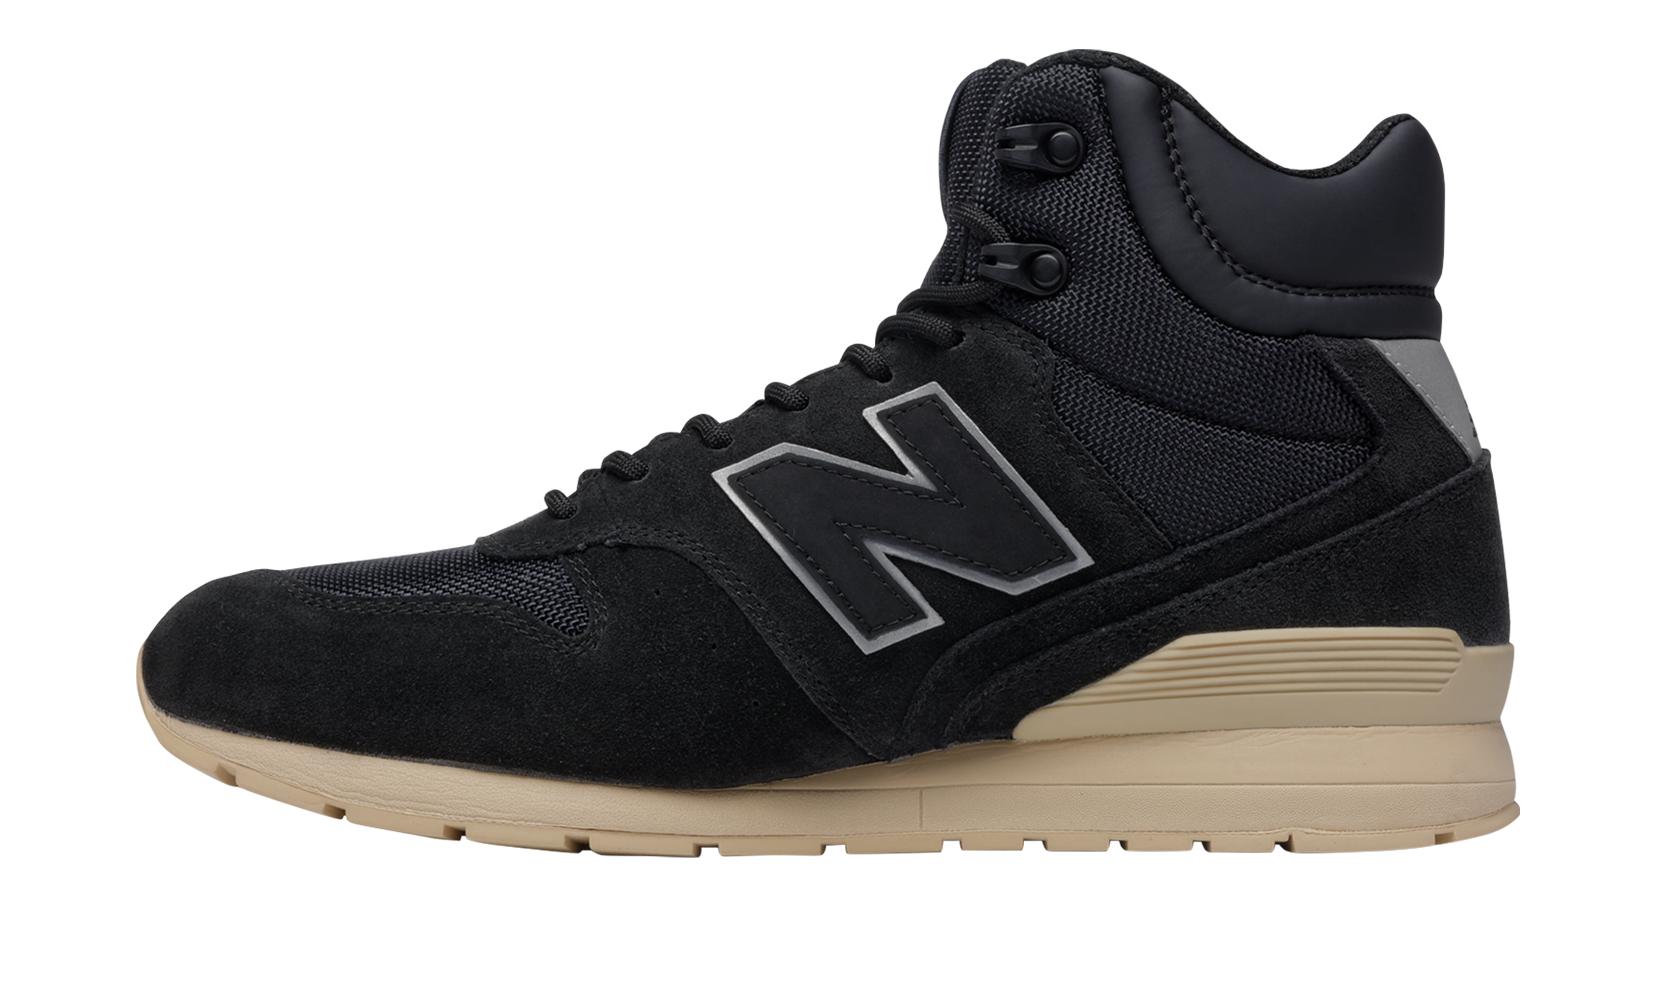 reputable site d24fd f2f08 Чоловіче взуття повсякденне New Balance 996 Winter Sneaker ...